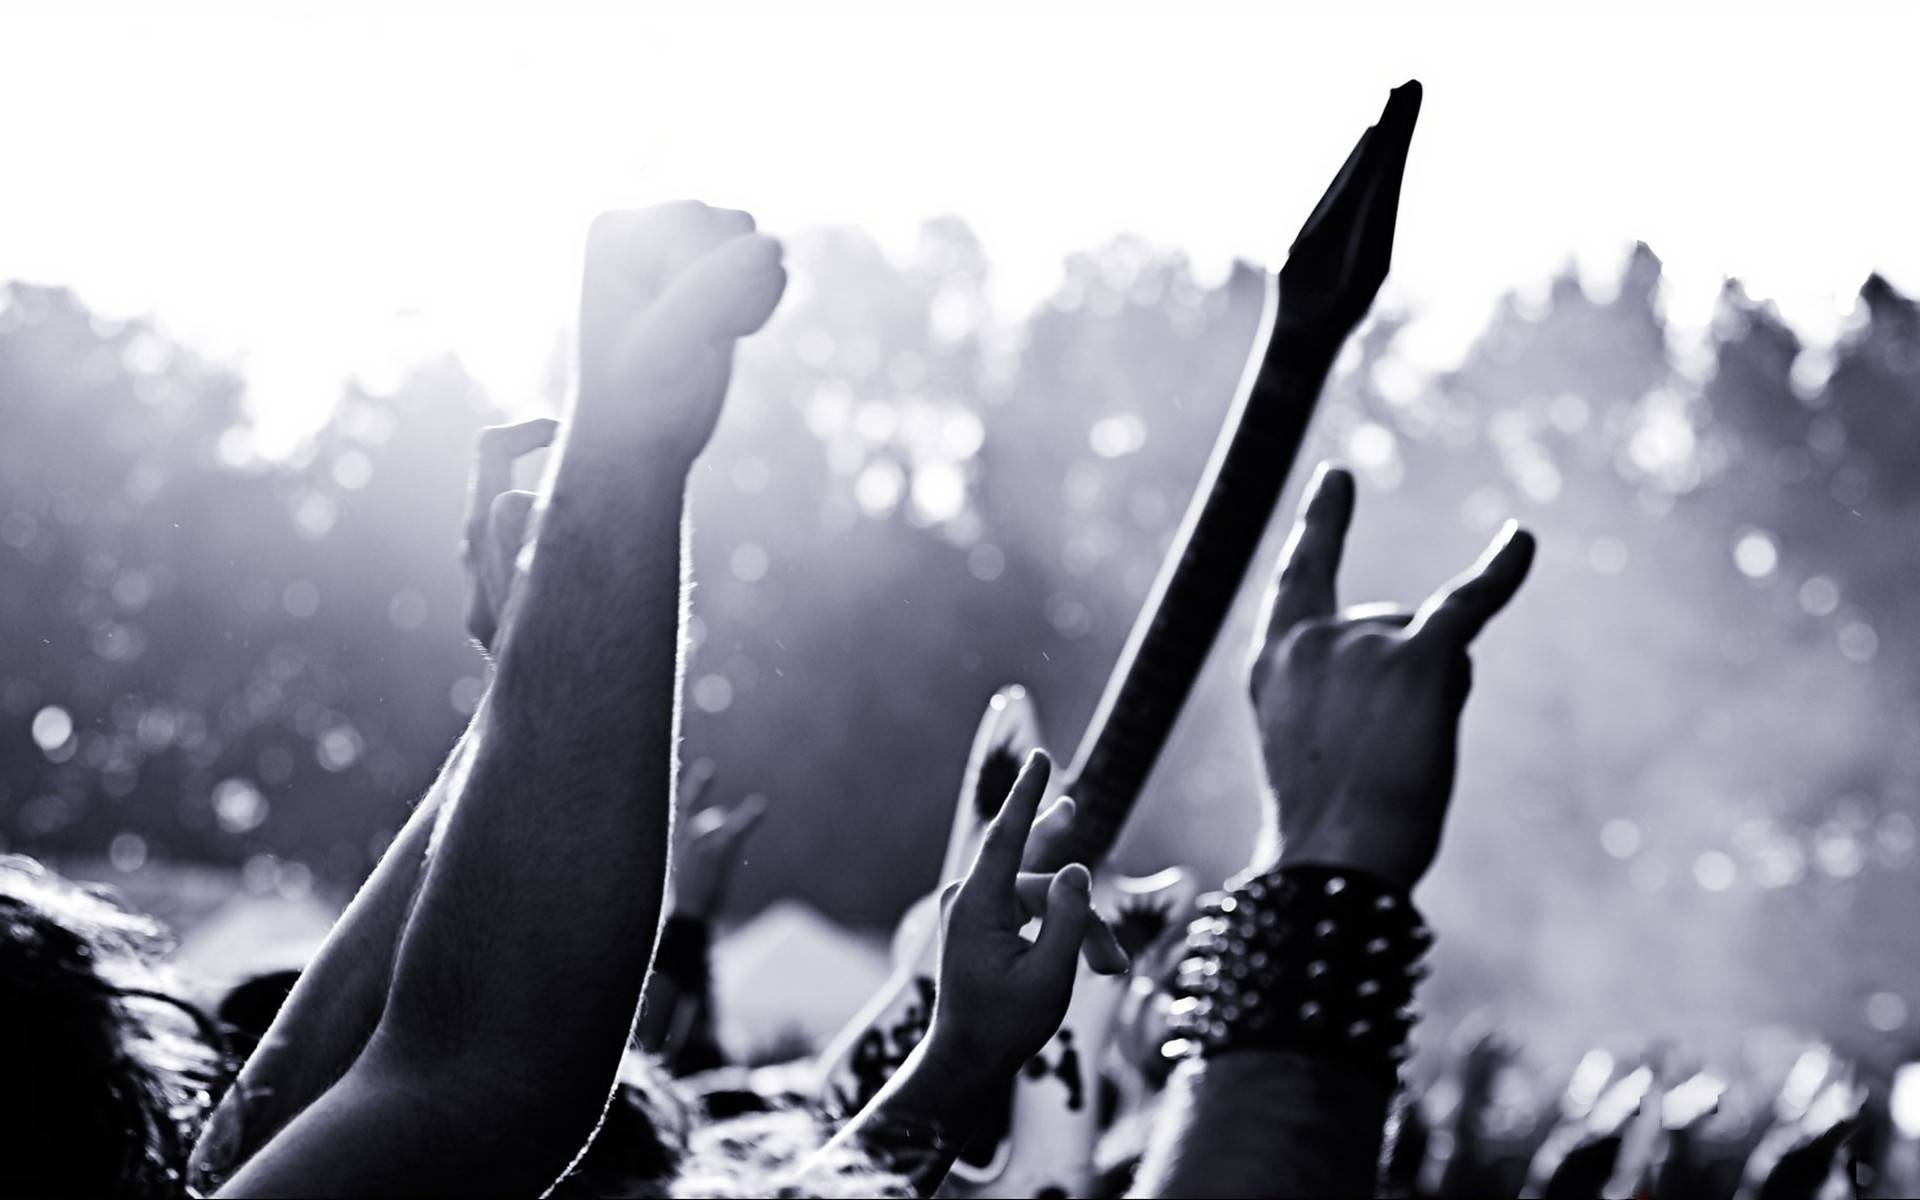 439970-metal-music-heavy-metal-fans